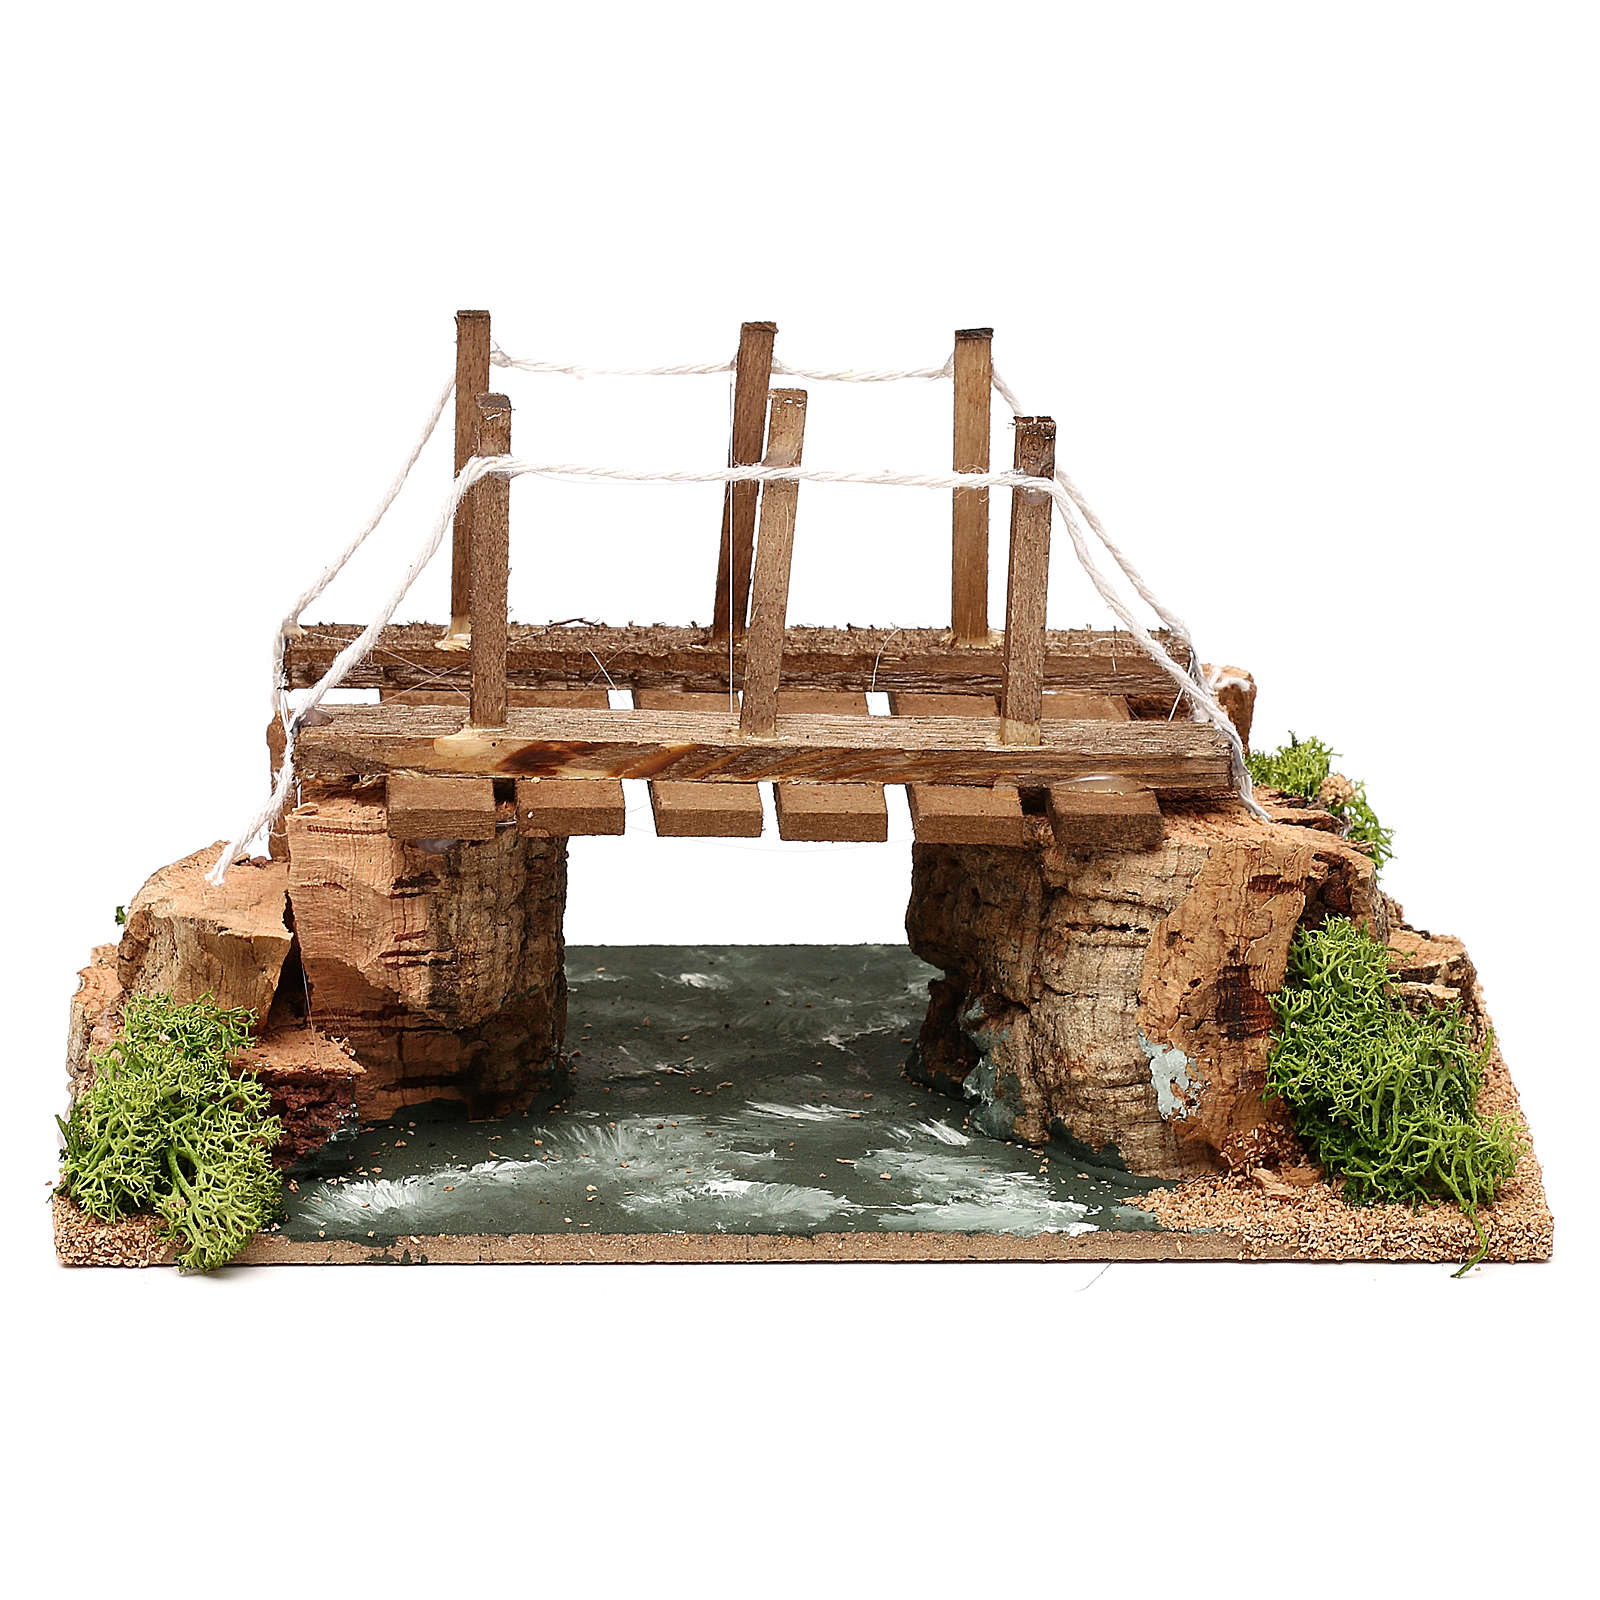 River with bridge 20x15x15 cm for Nativity scenes of 8-10 cm 4